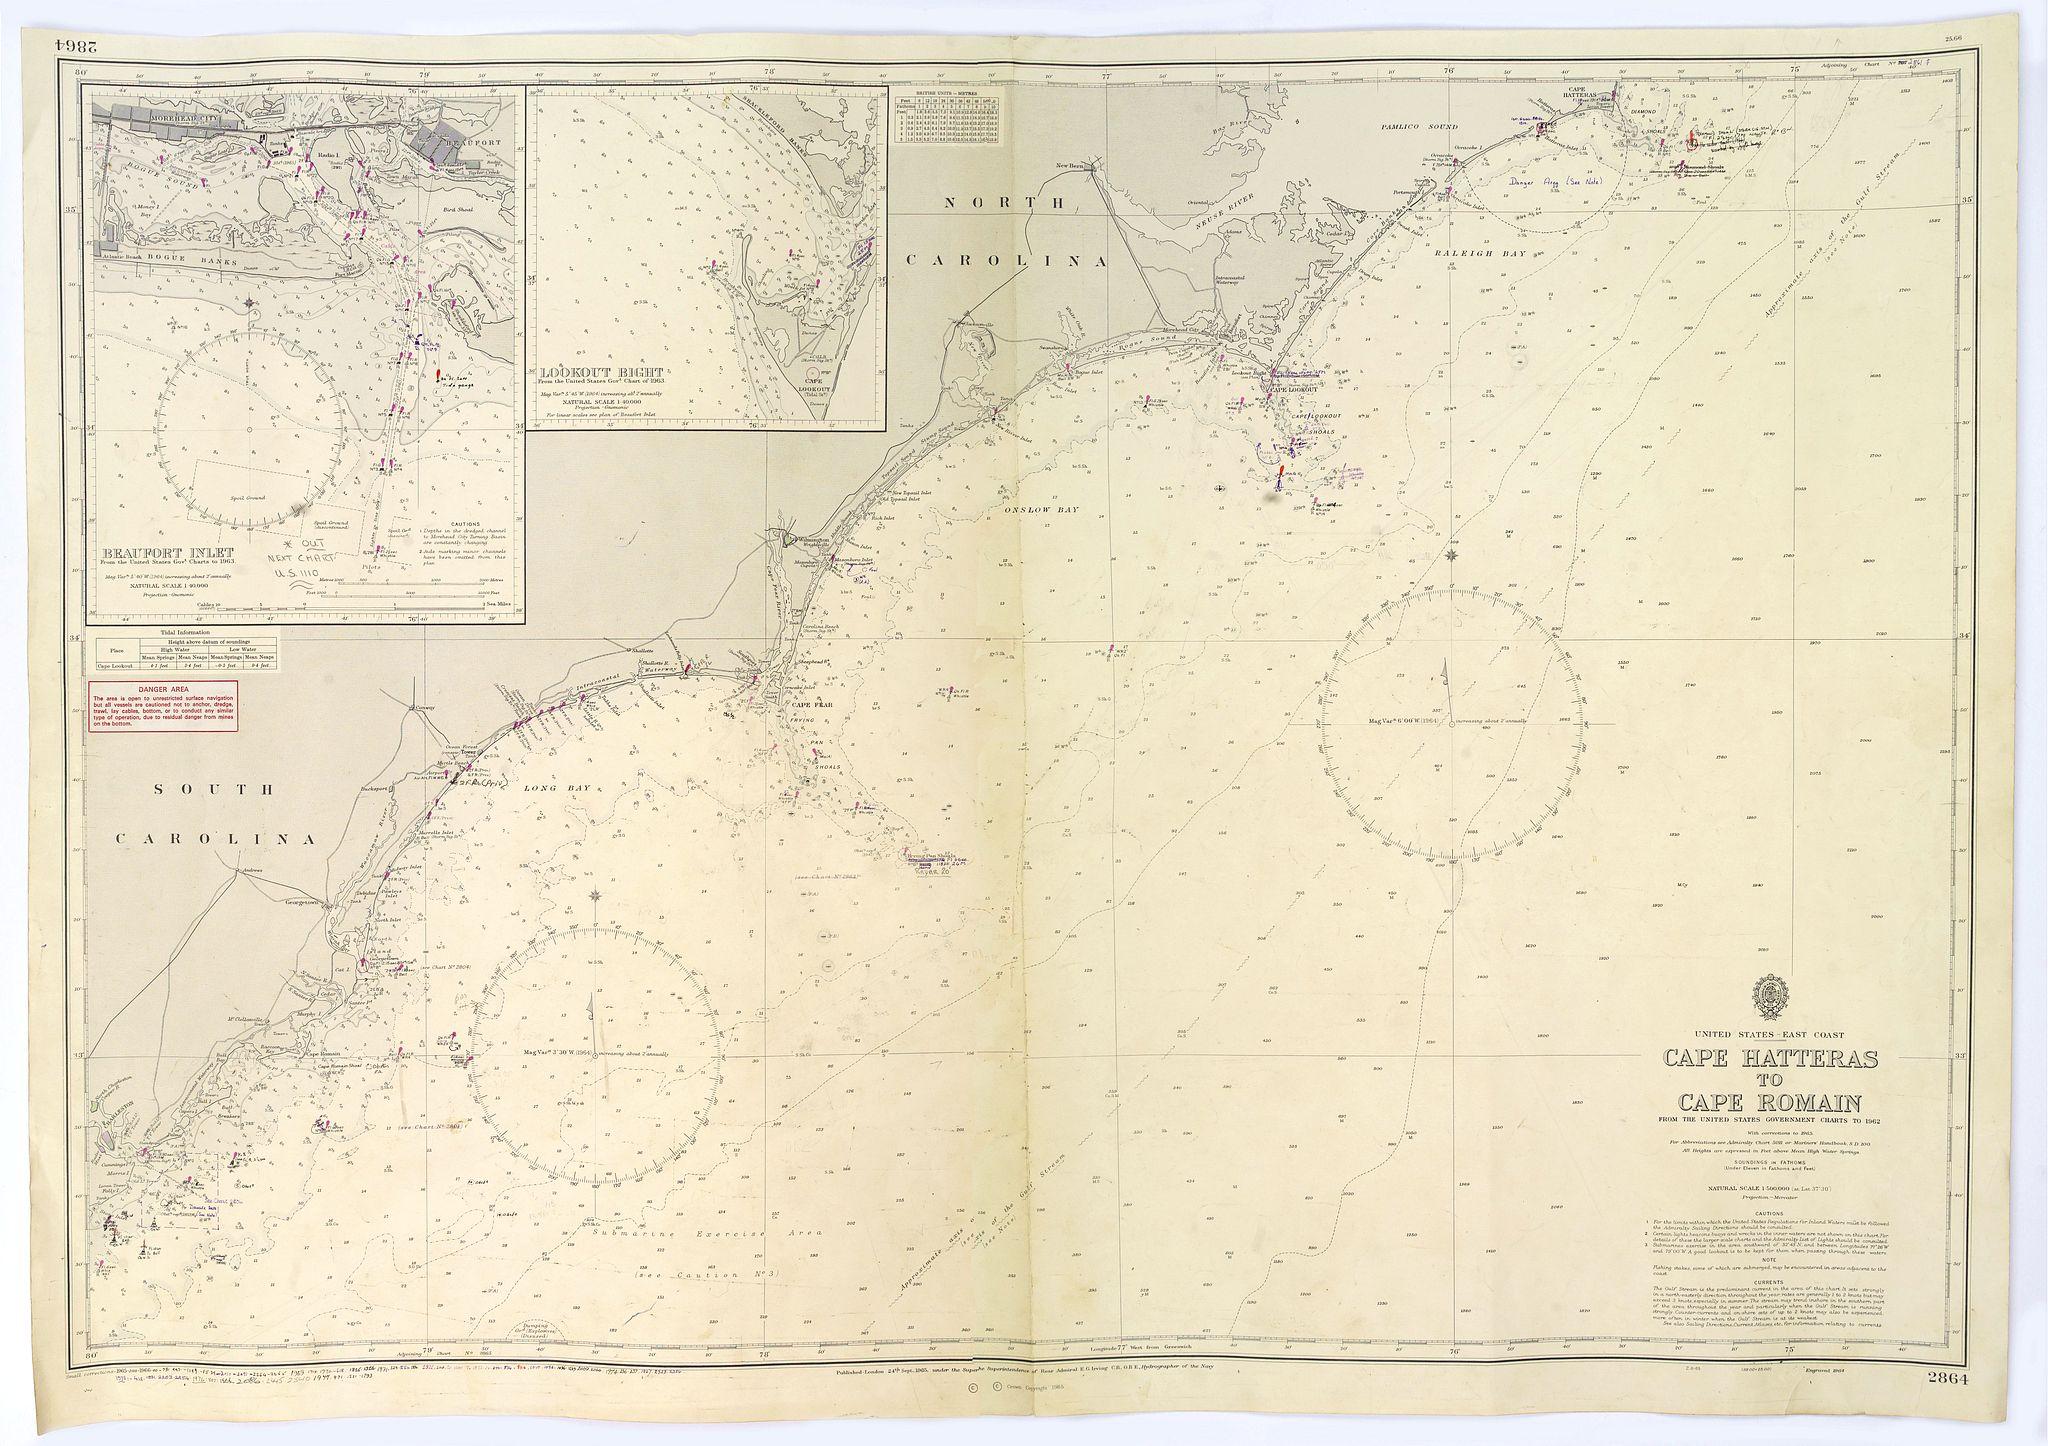 ADMIRALTY SEA CHART. -  Cape Hatteras to Cape Romain.